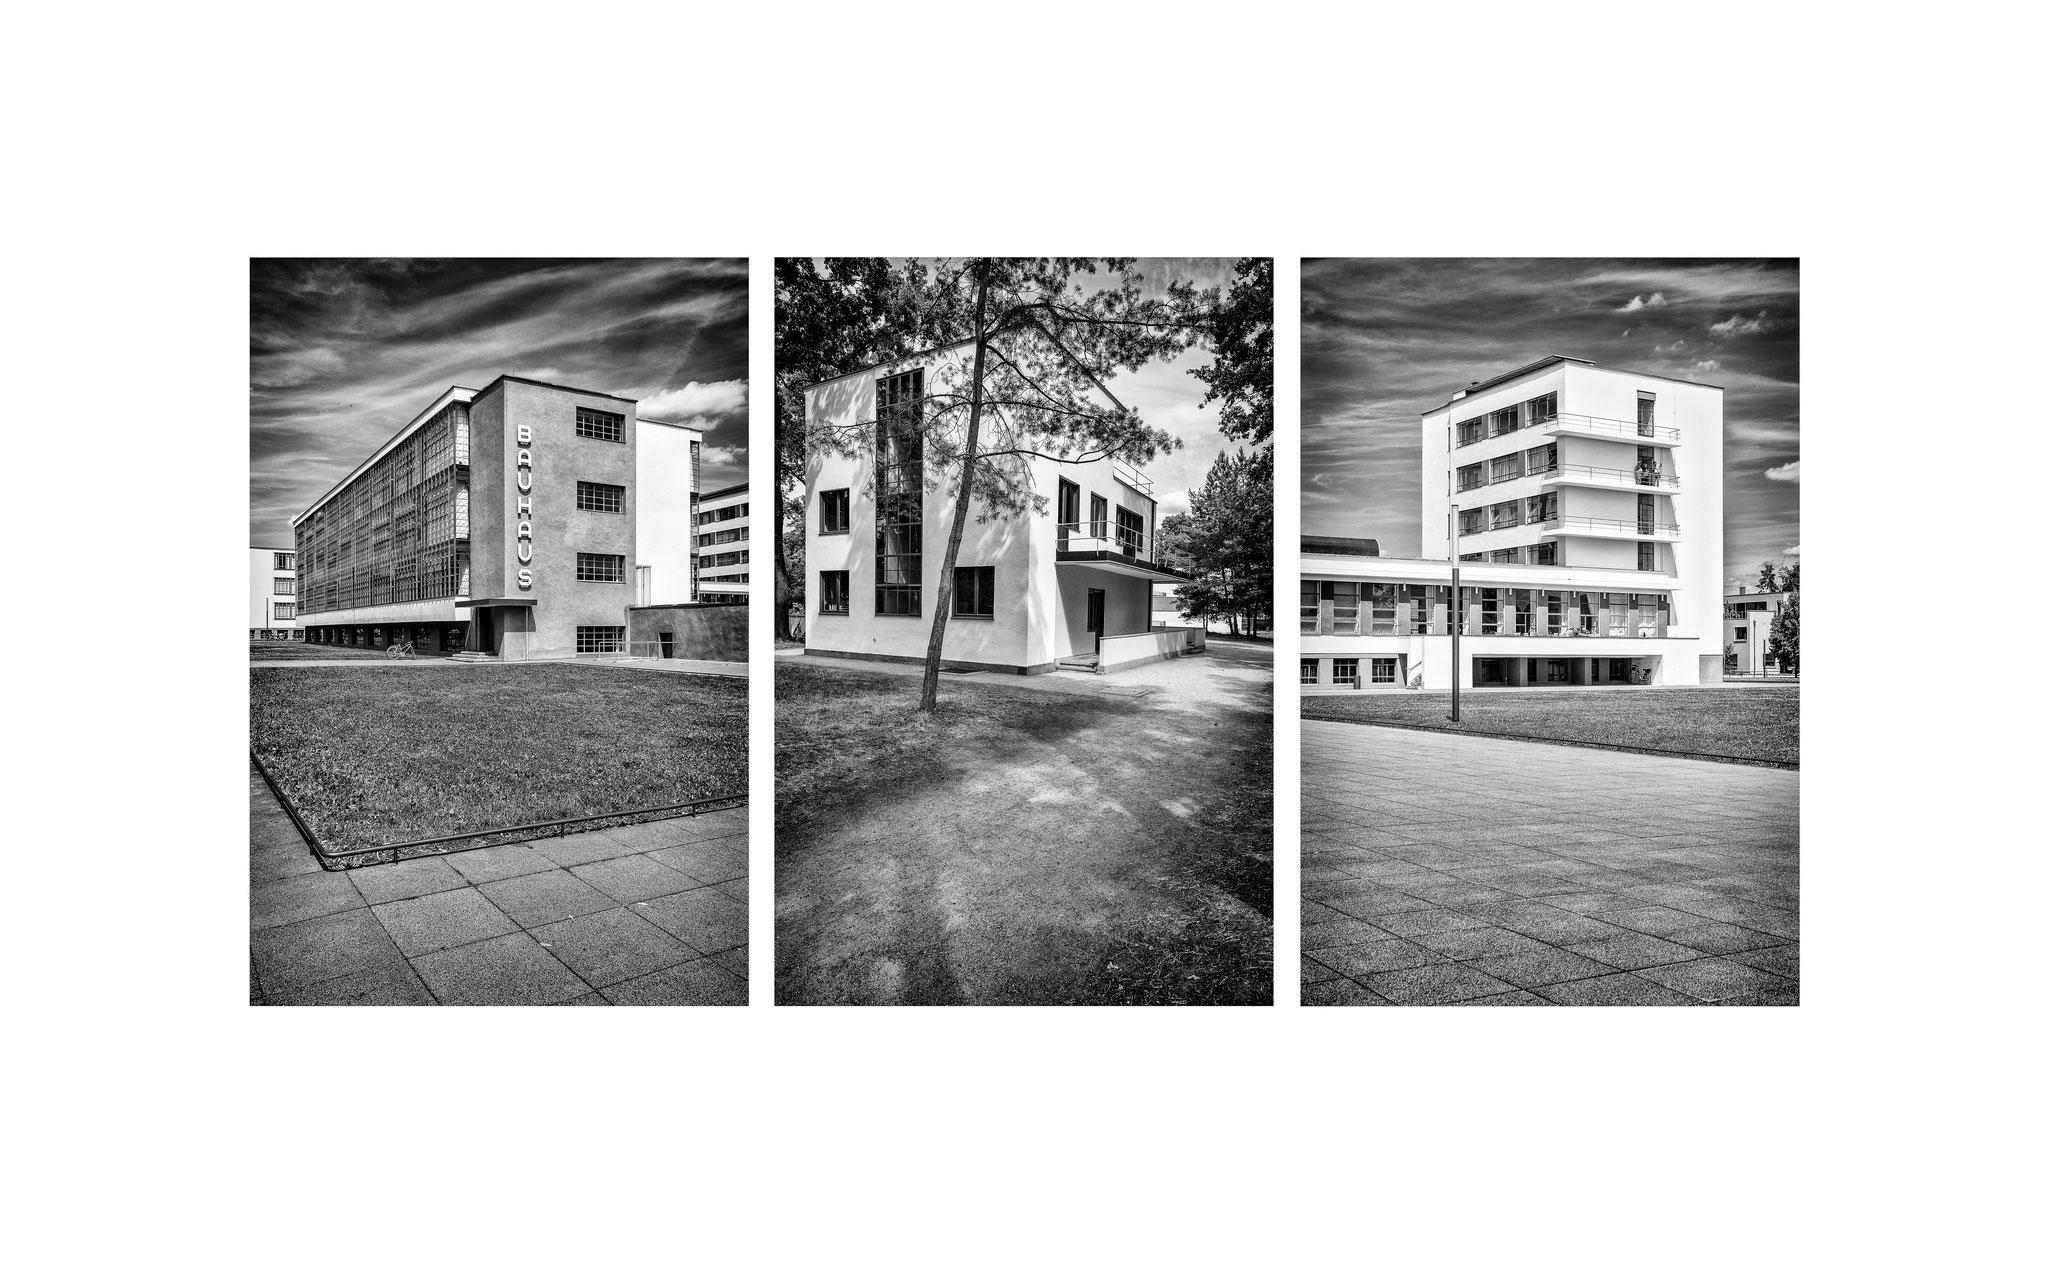 Weltkulturerbe Bauhaus-Stätten, Dessau